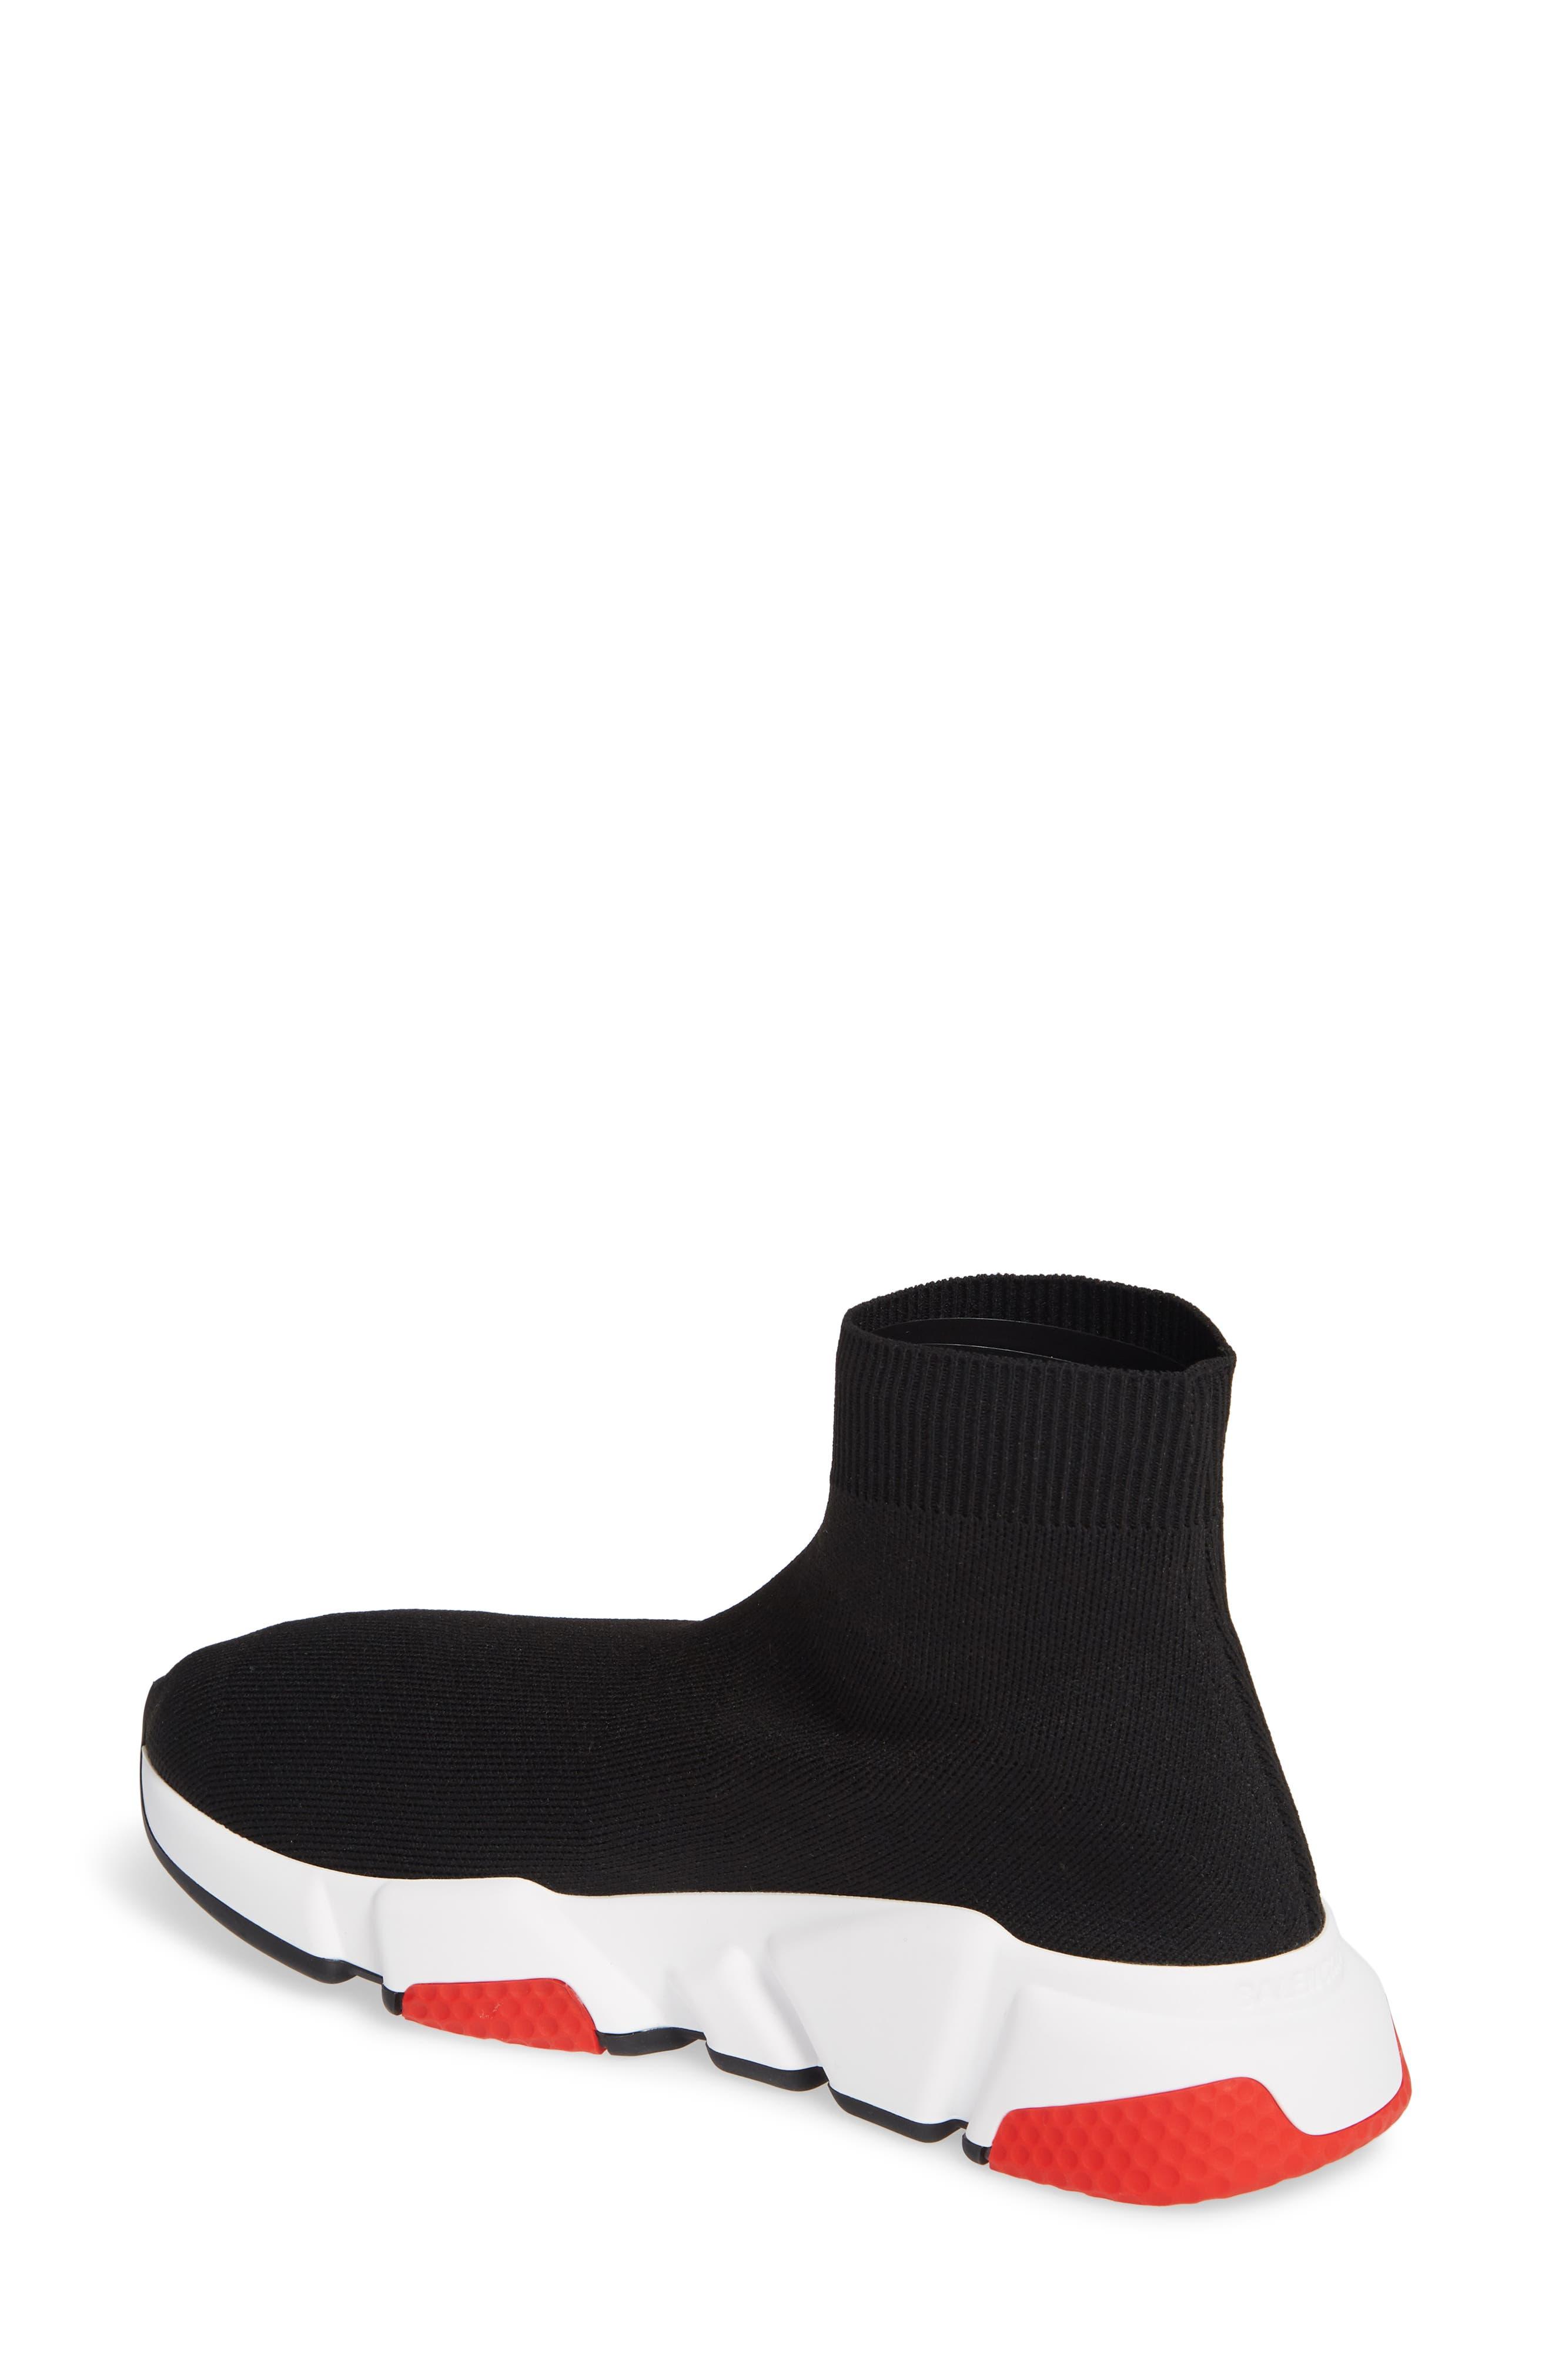 BALENCIAGA, Speed Knit Sneaker, Alternate thumbnail 2, color, BLACK/ RED